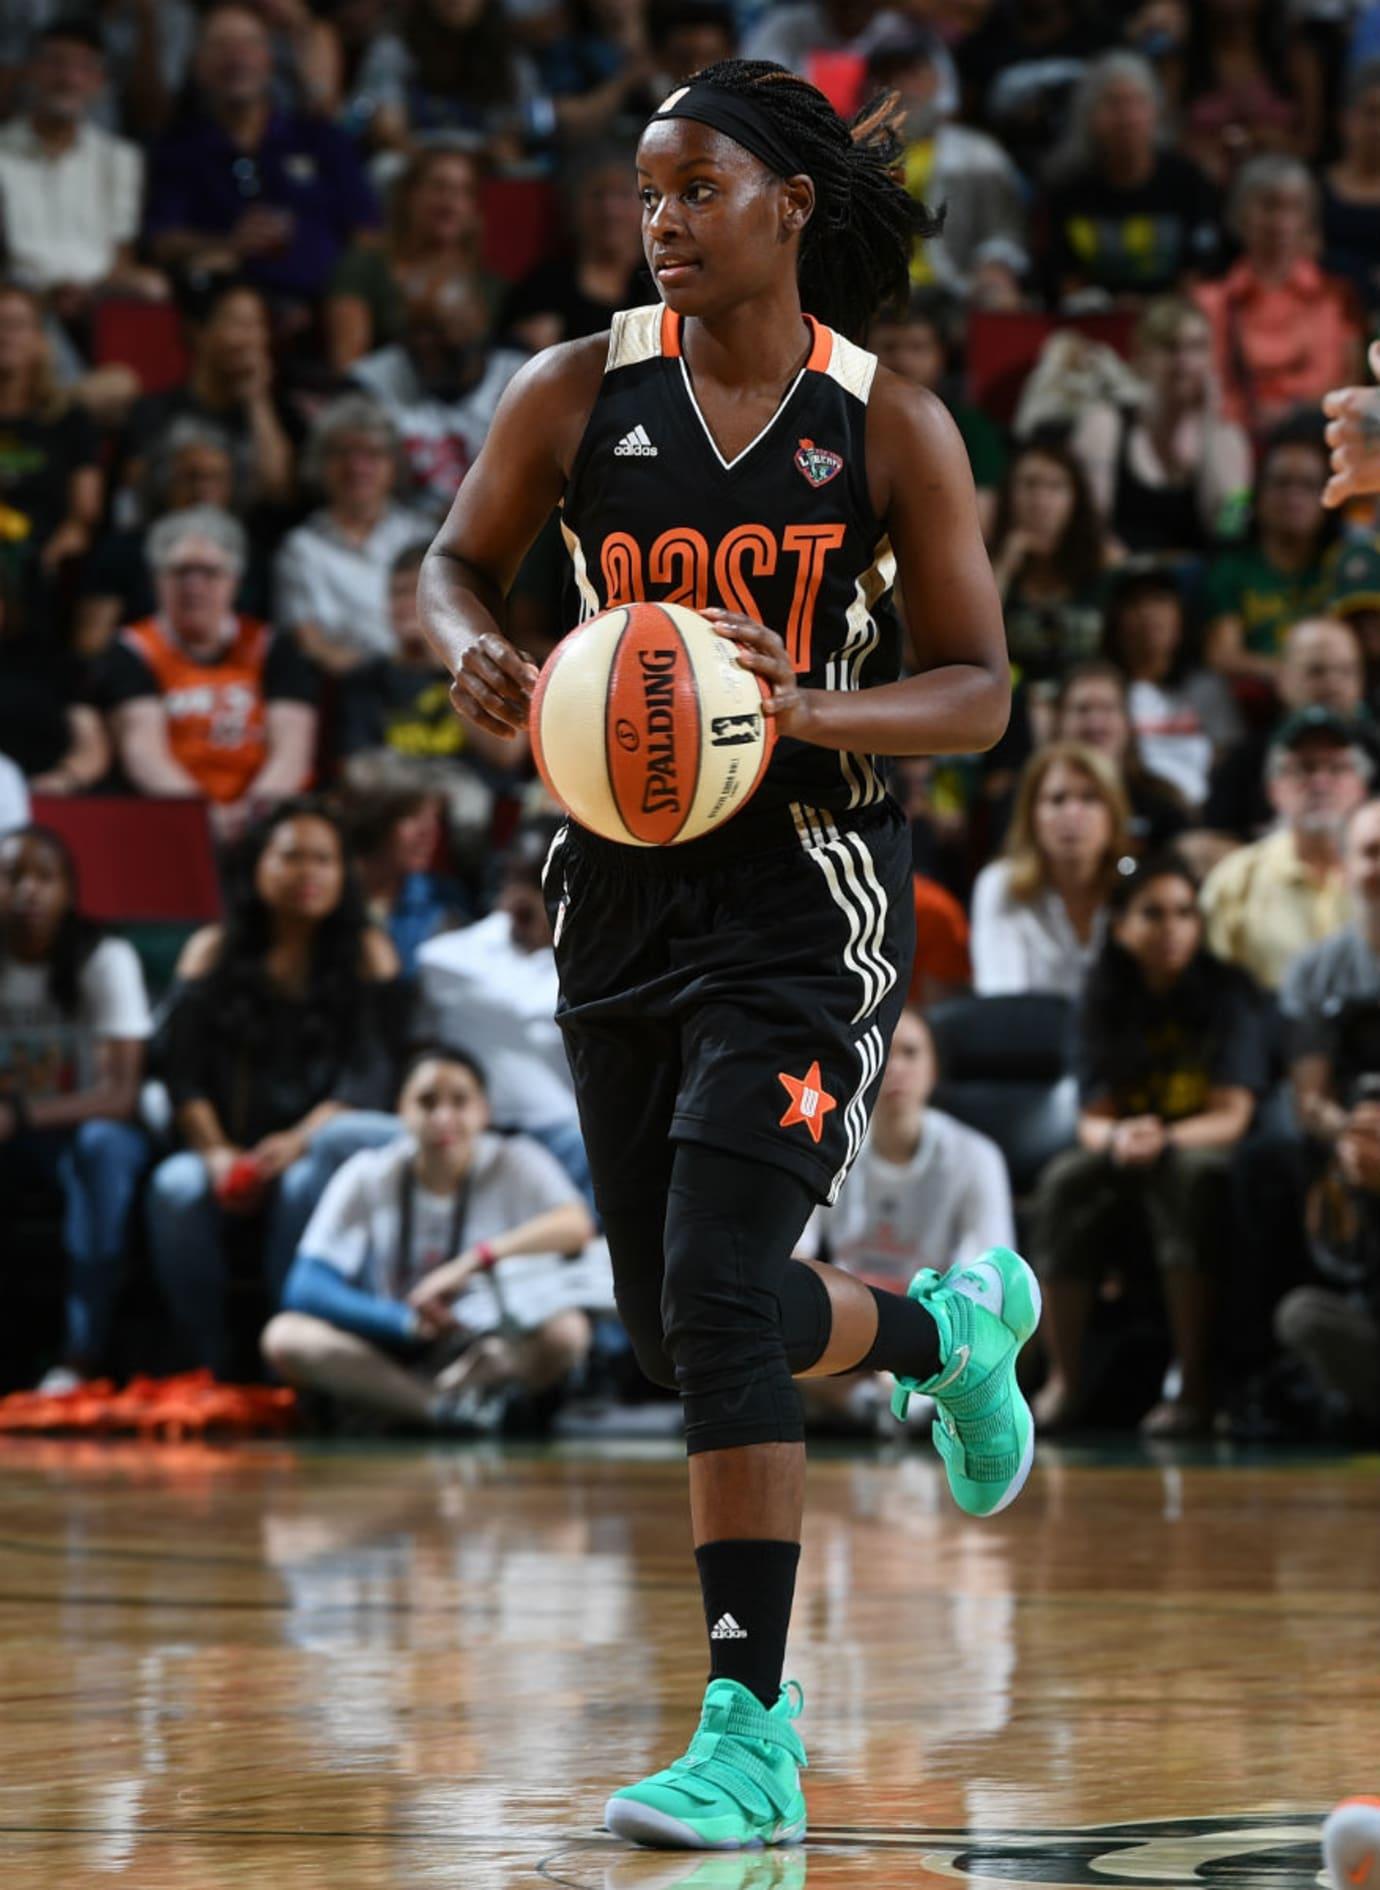 Sugar Rodgers Nike LeBron Soldier 11 WNBA All-Star PE